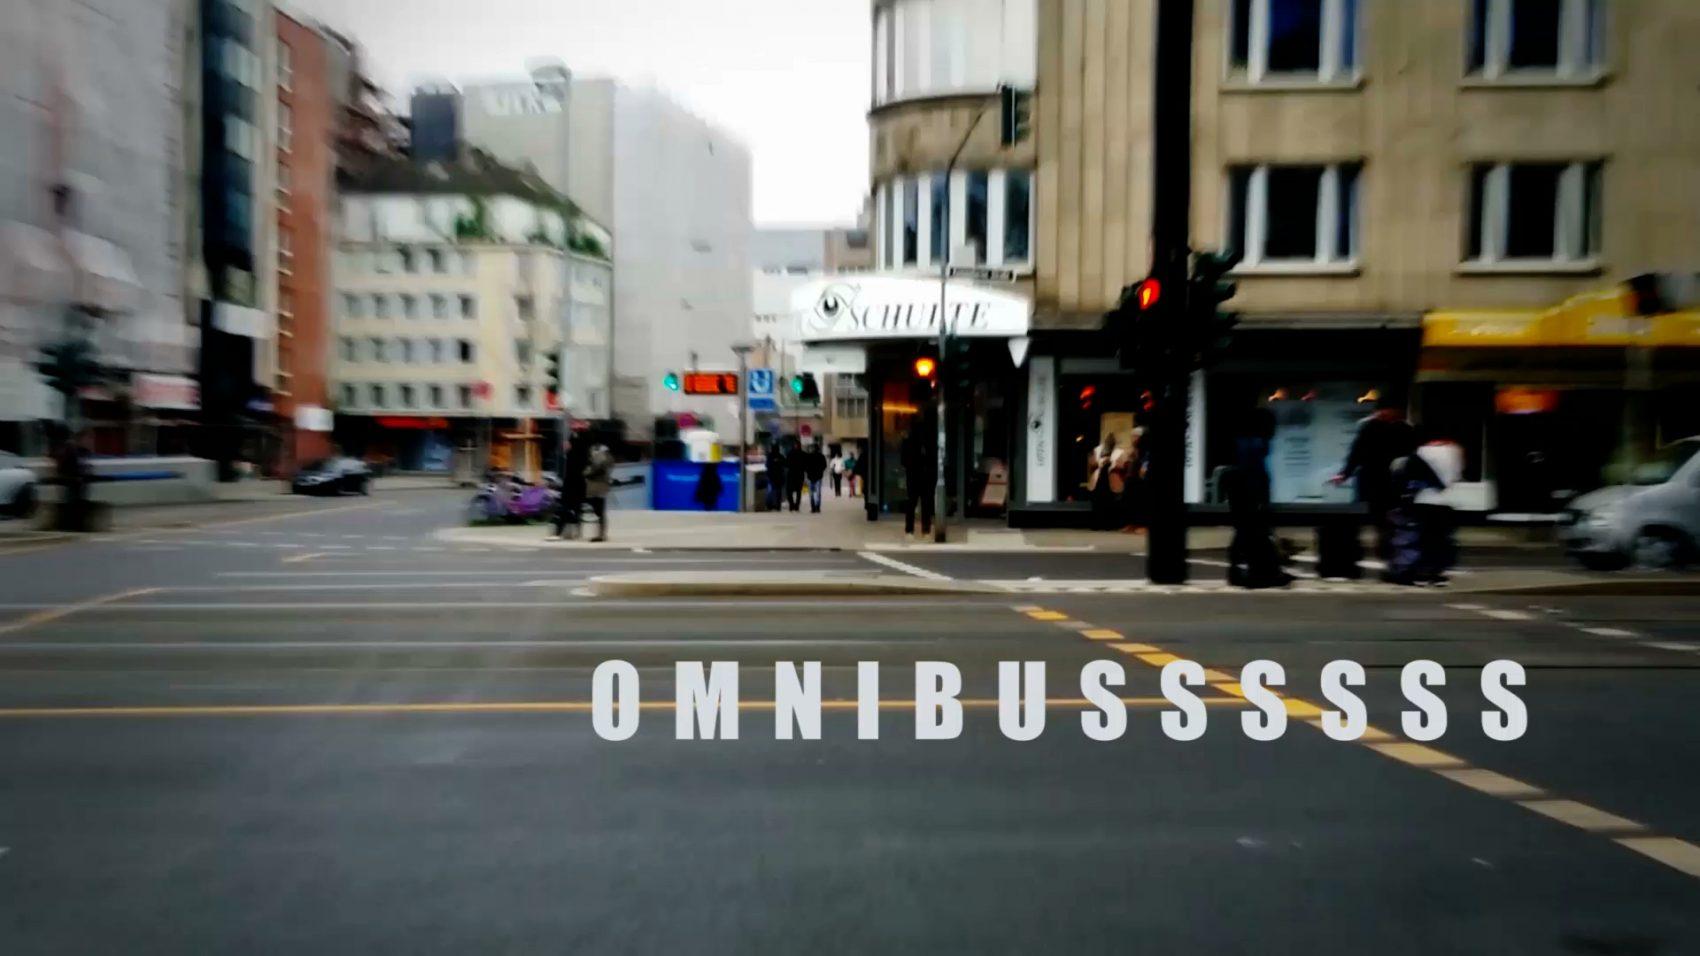 Omnibussssss